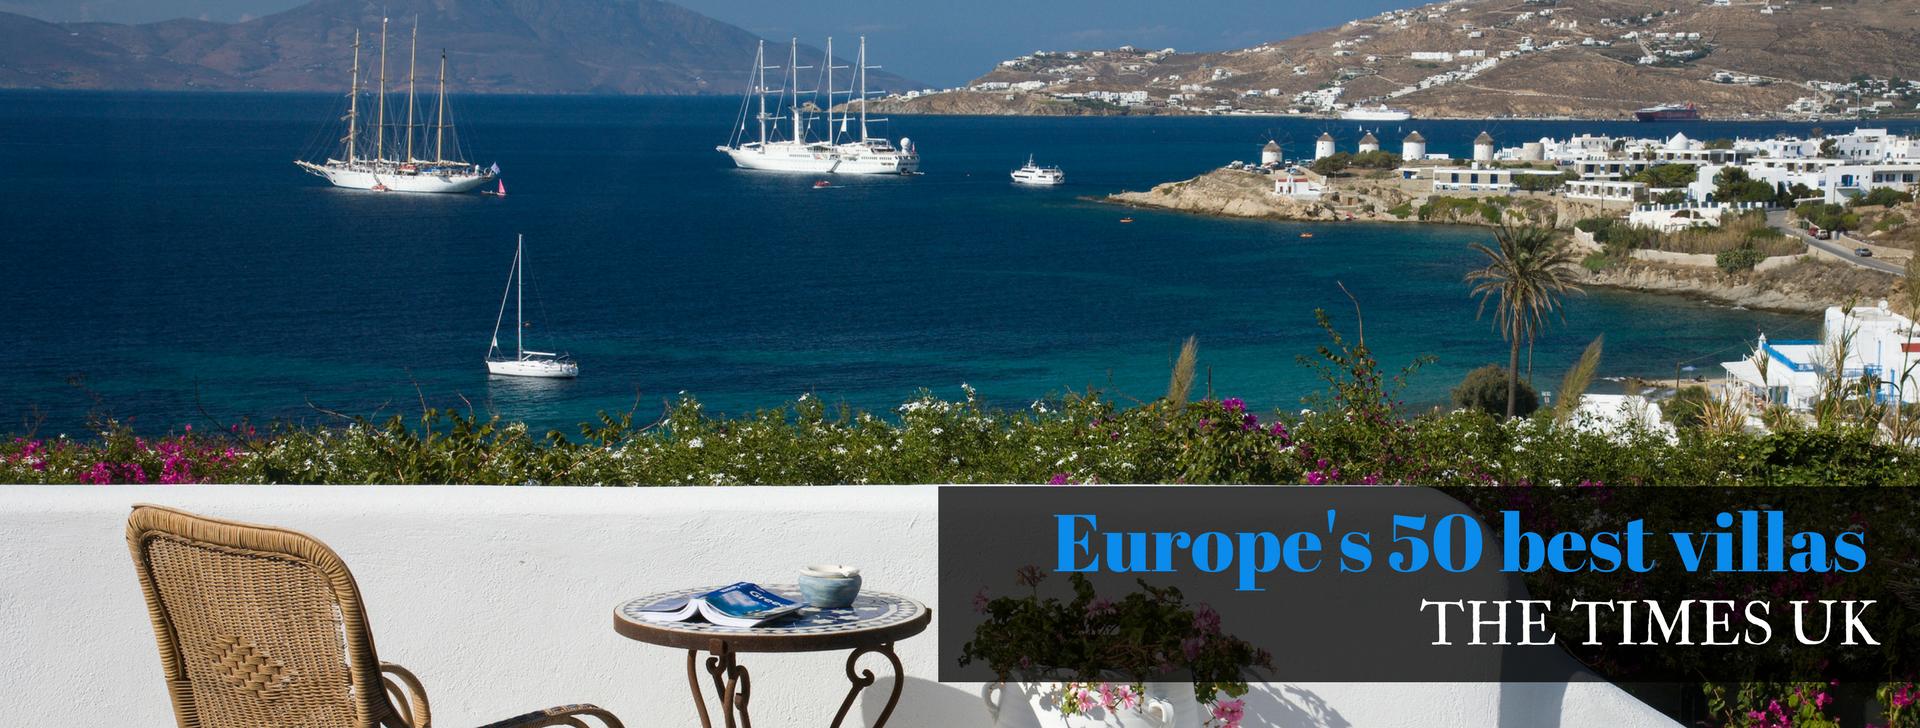 Europes-50-best-villas